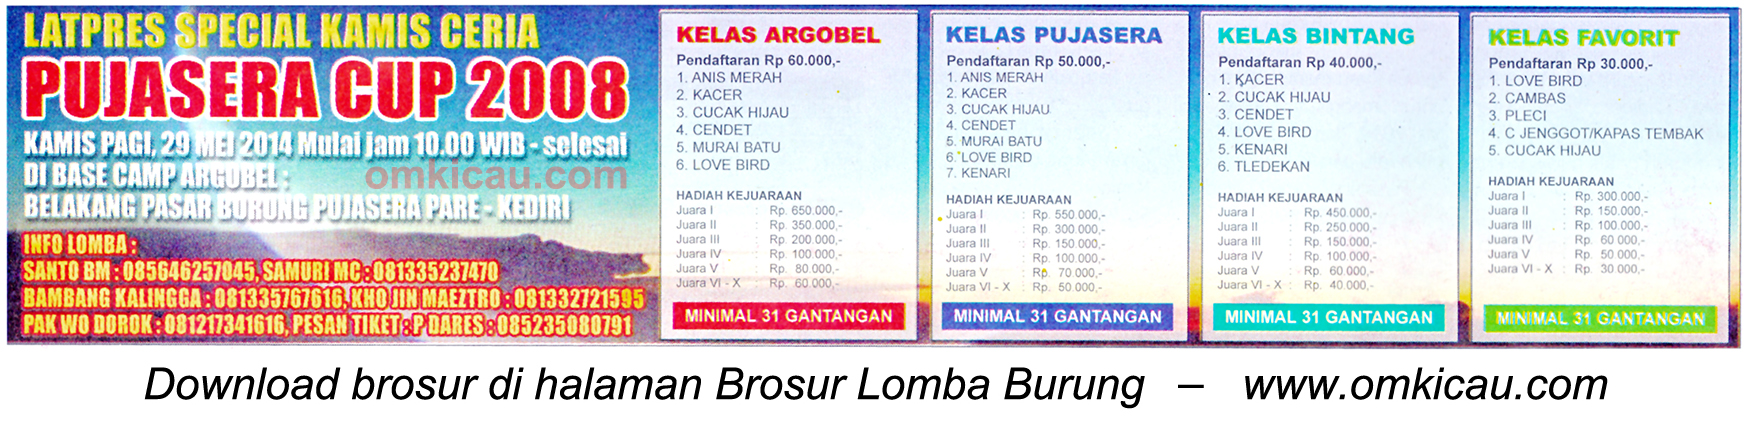 Brosur Latpres Special Kamis Ceria Pujasera Cup, Kediri, 29 Mei 2014